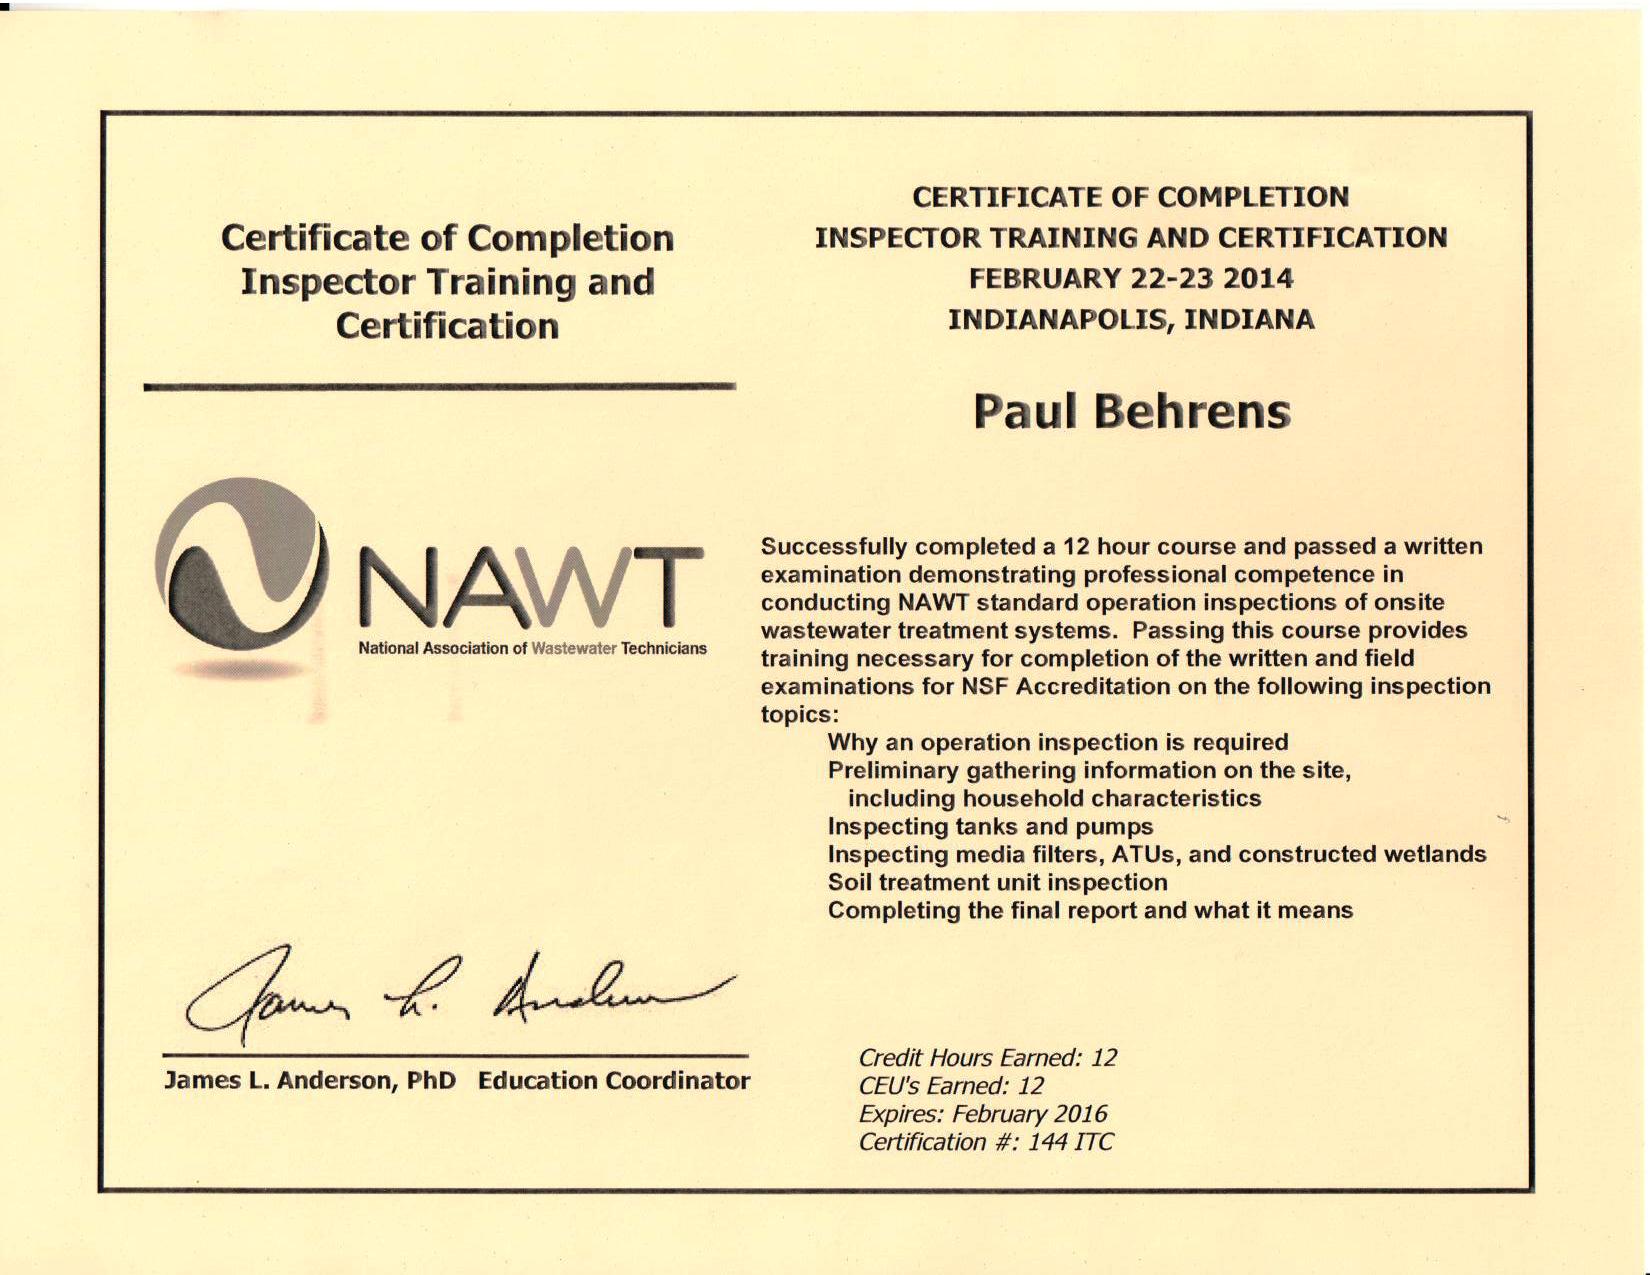 P. Behrens NAWT Inspector.Certification 2.2014